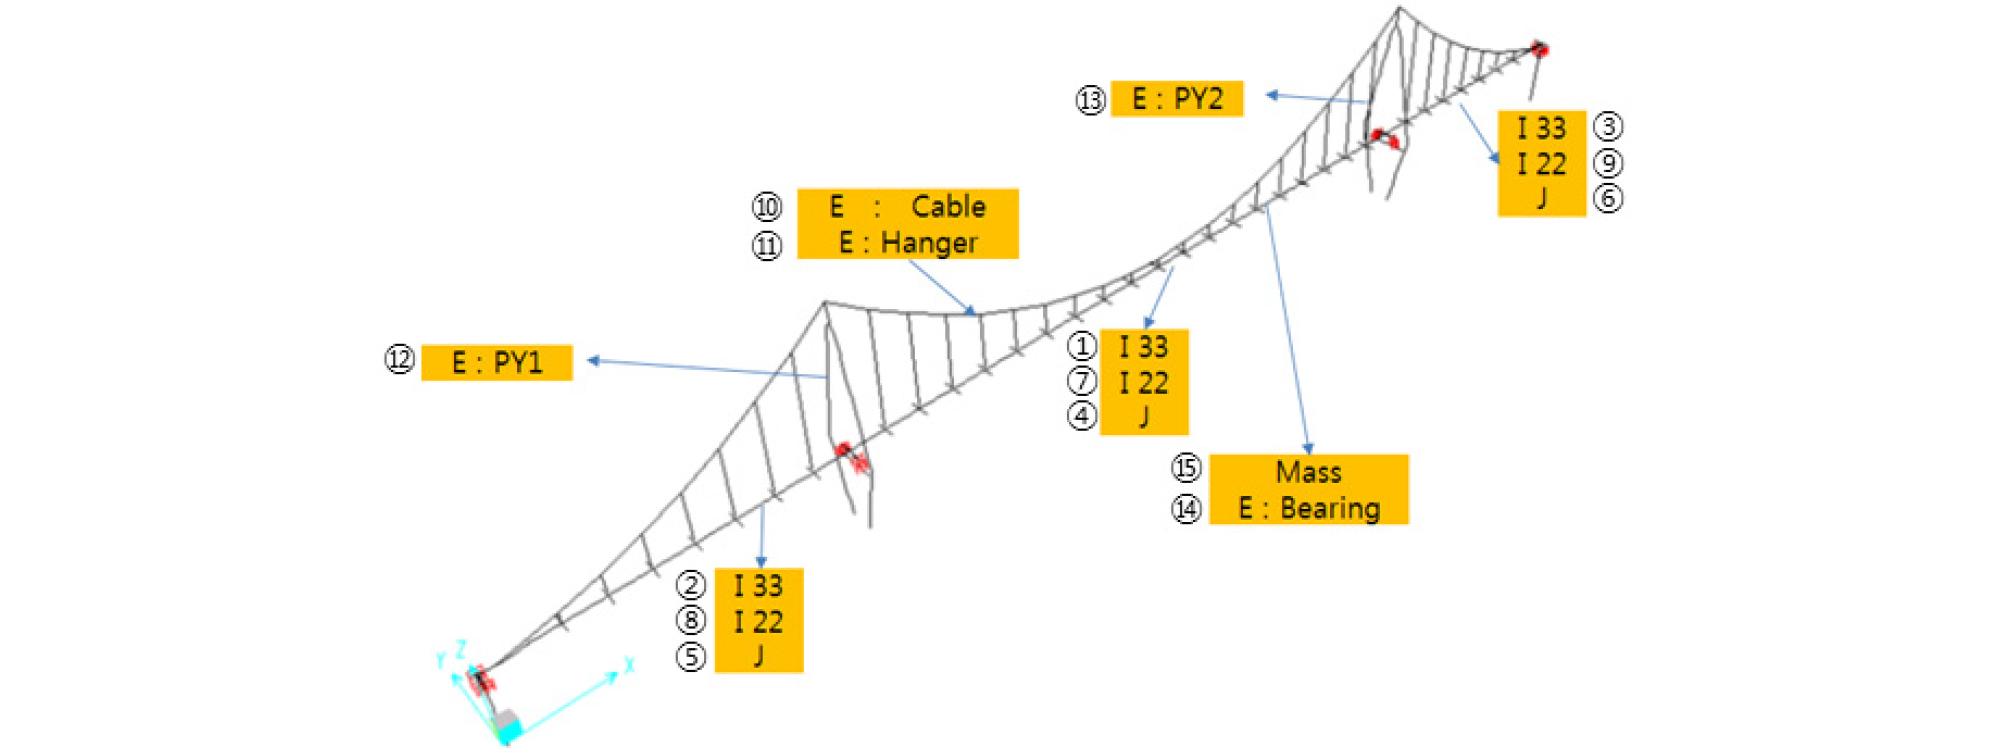 http://static.apub.kr/journalsite/sites/ksce/2019-039-01/N0110390115/images/Figure_KSCE_39_1_15_F7.jpg